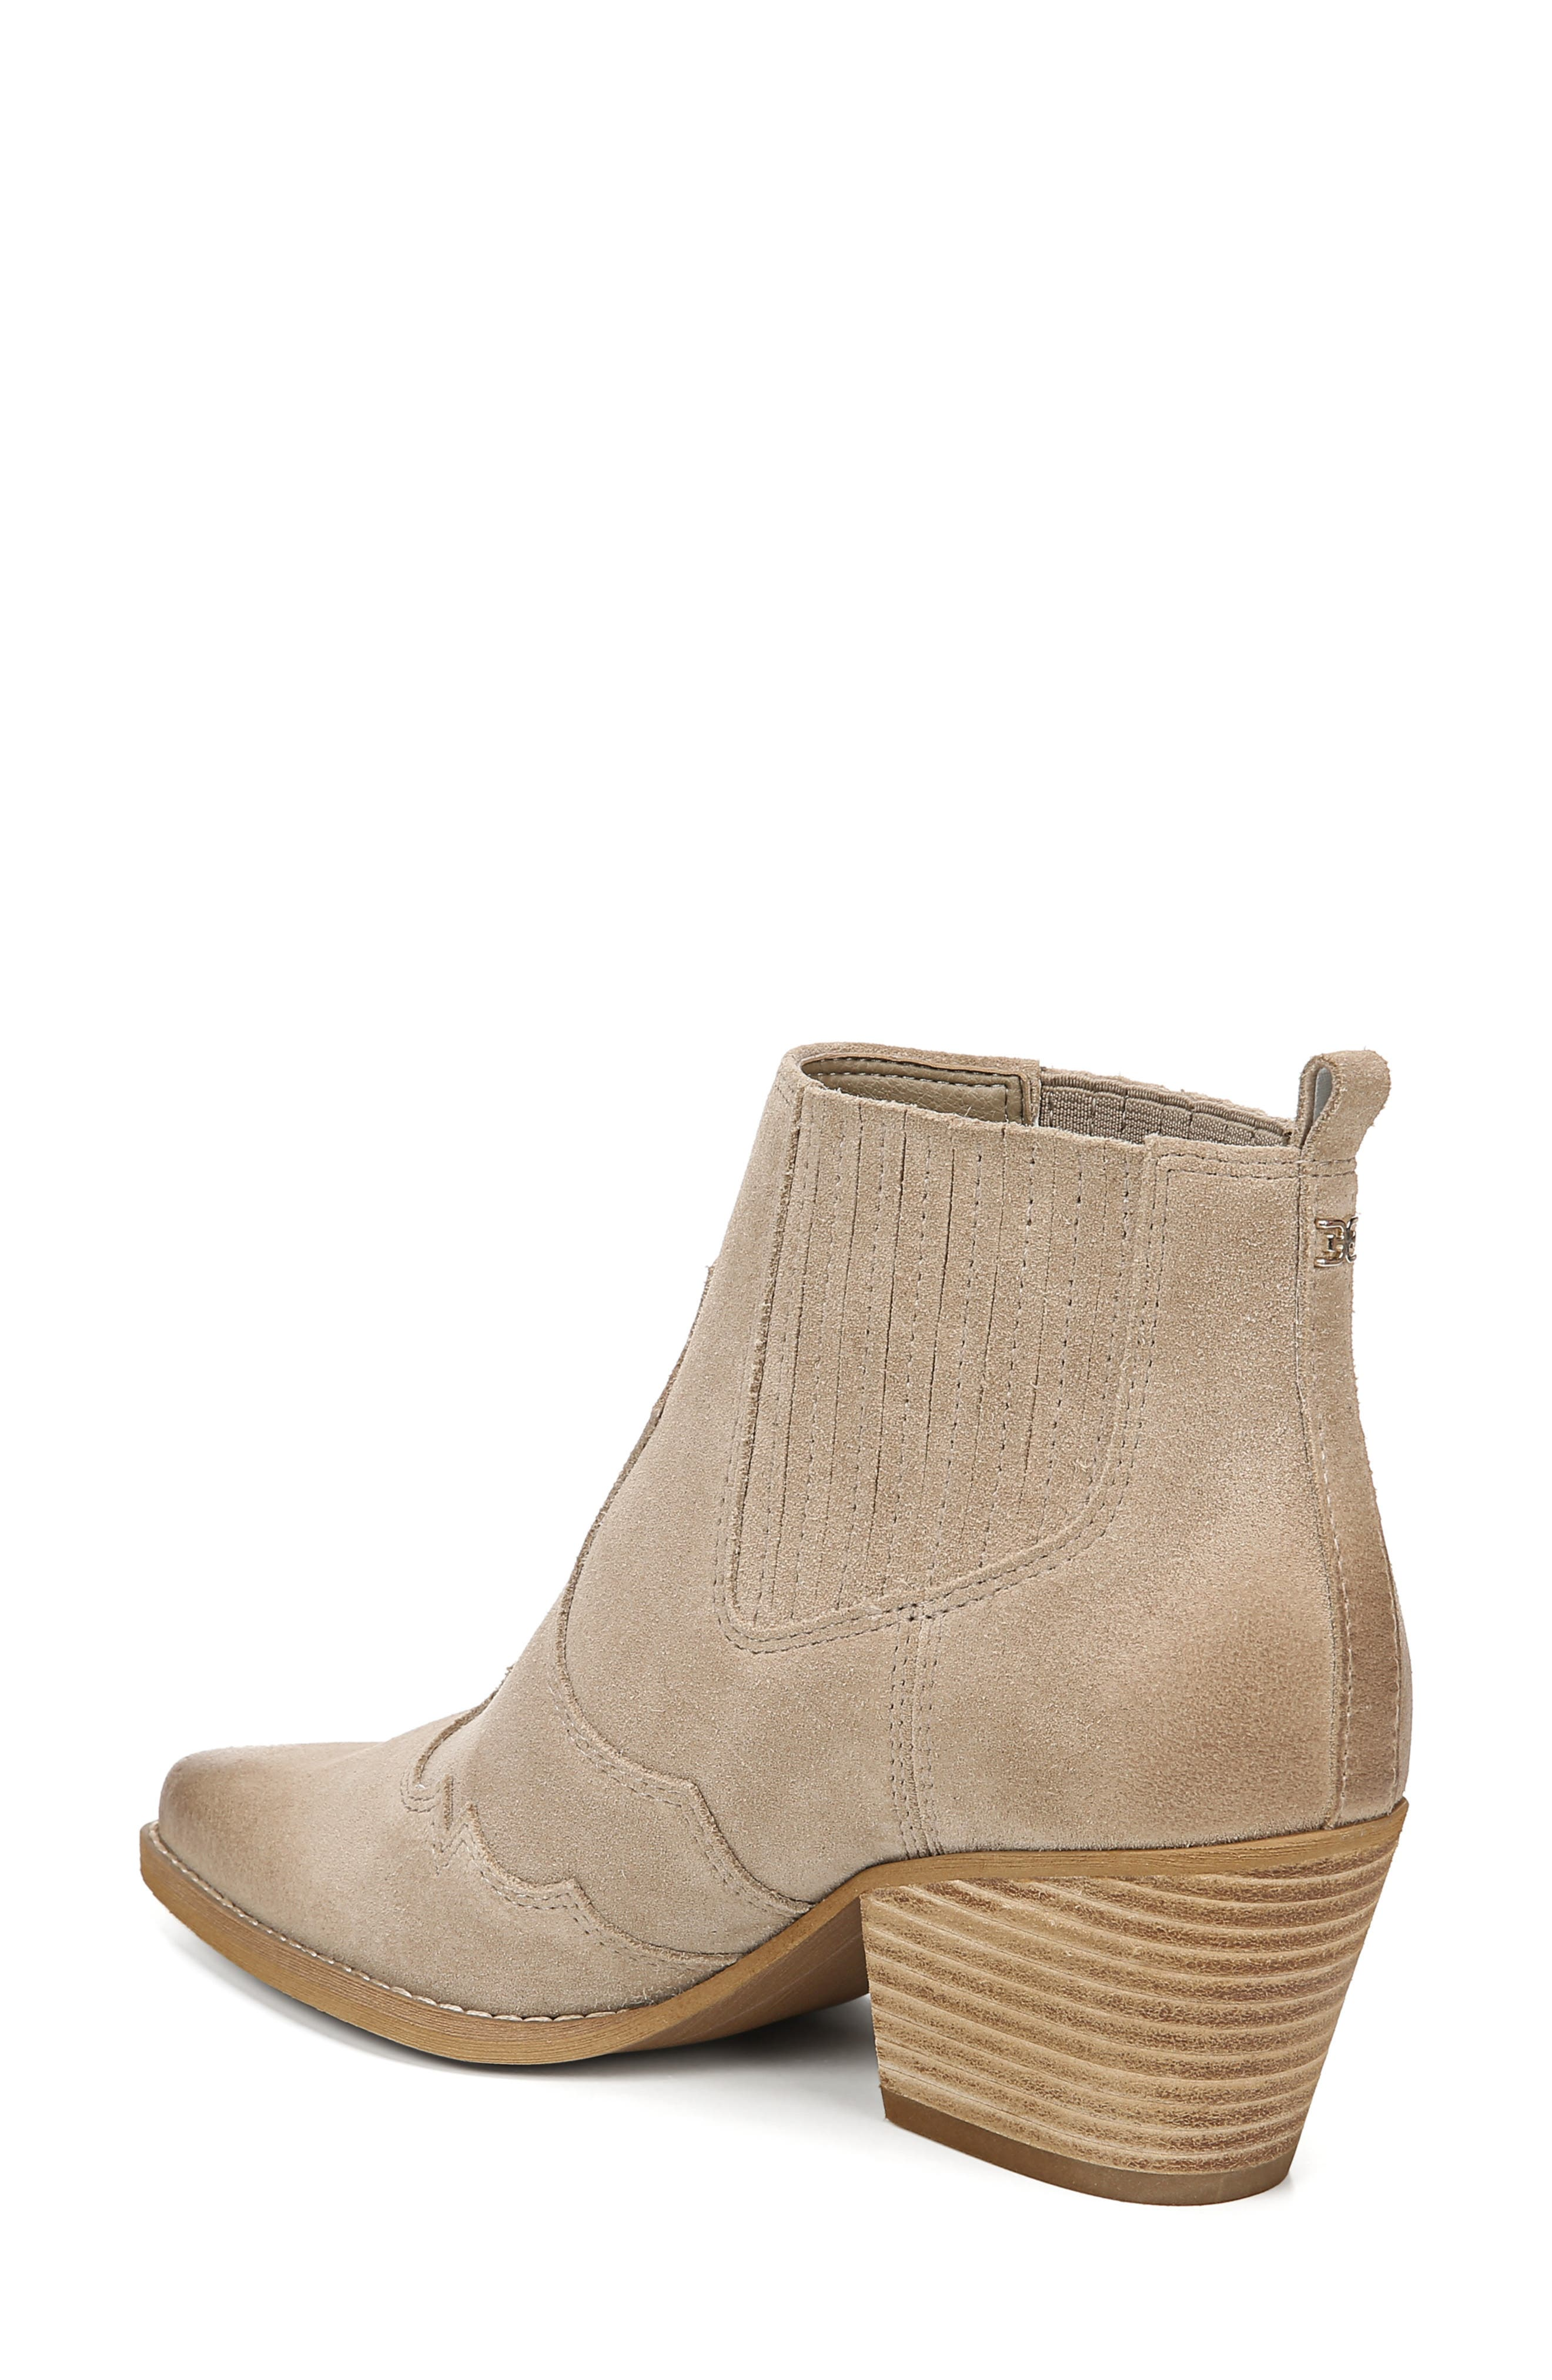 c875bb4ea Sam Edelman Boots